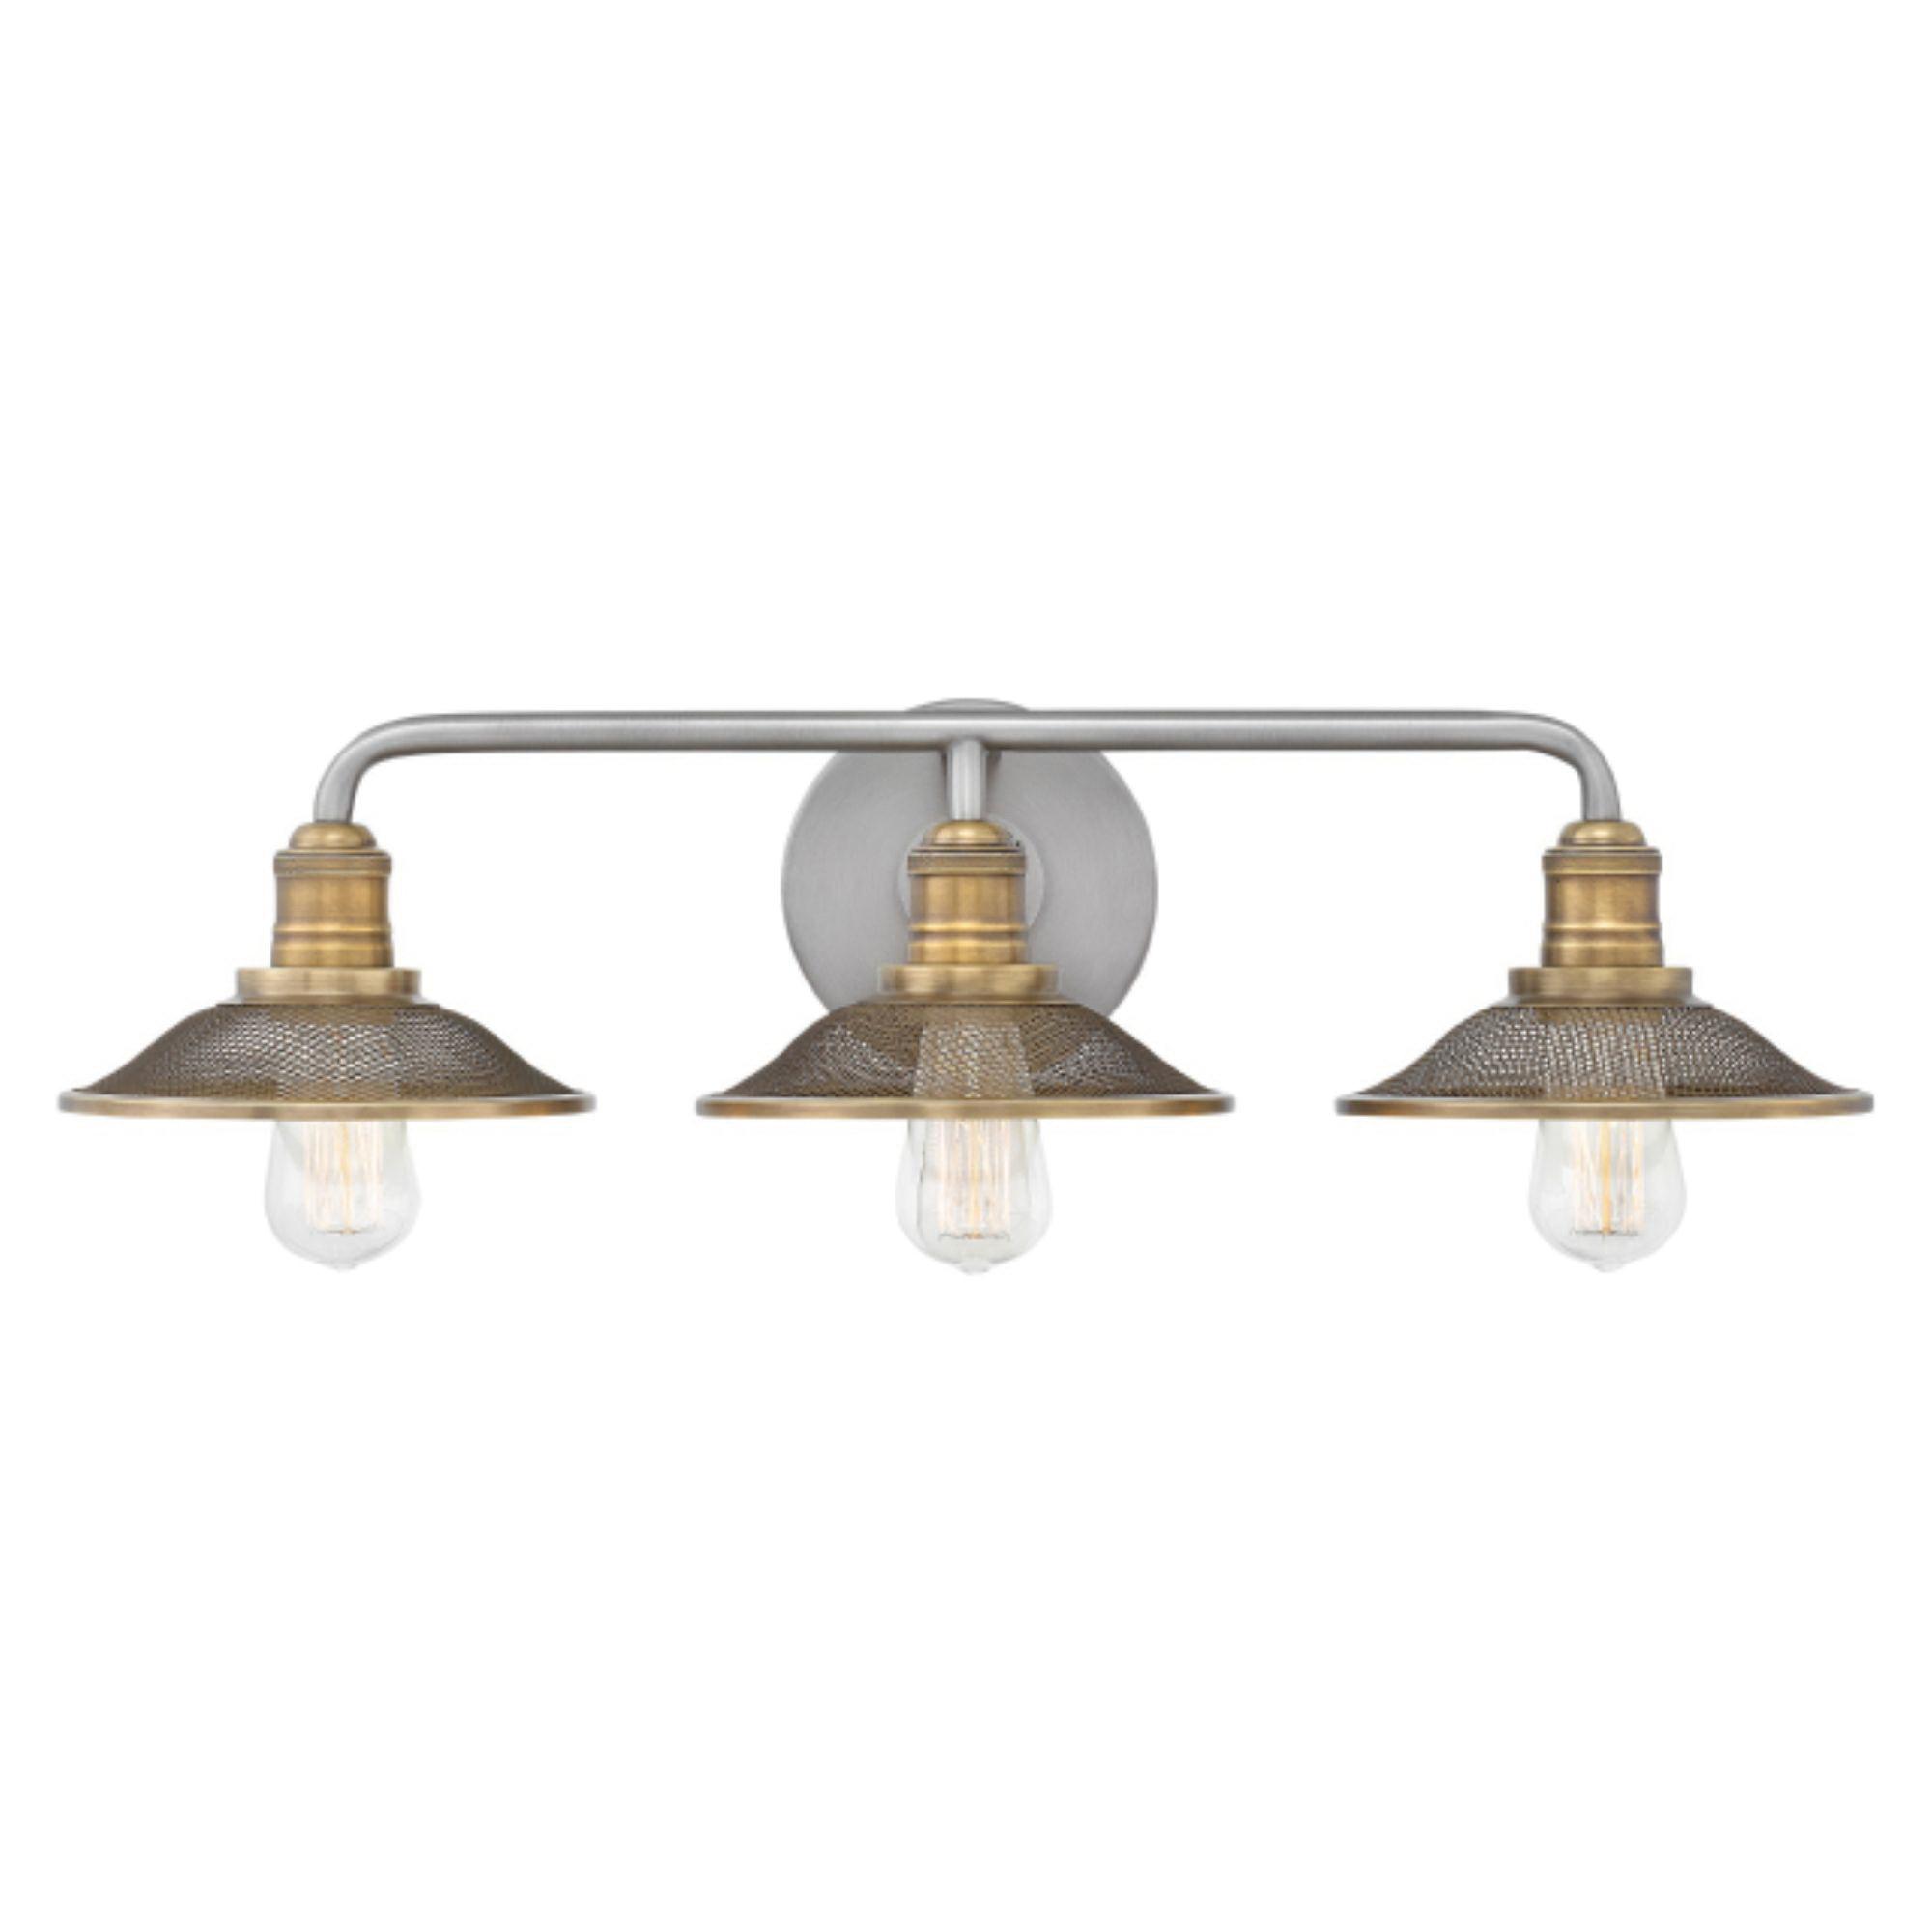 Hinkley Lighting 5293an 3 Light Bath 100 Watt 120 Volt